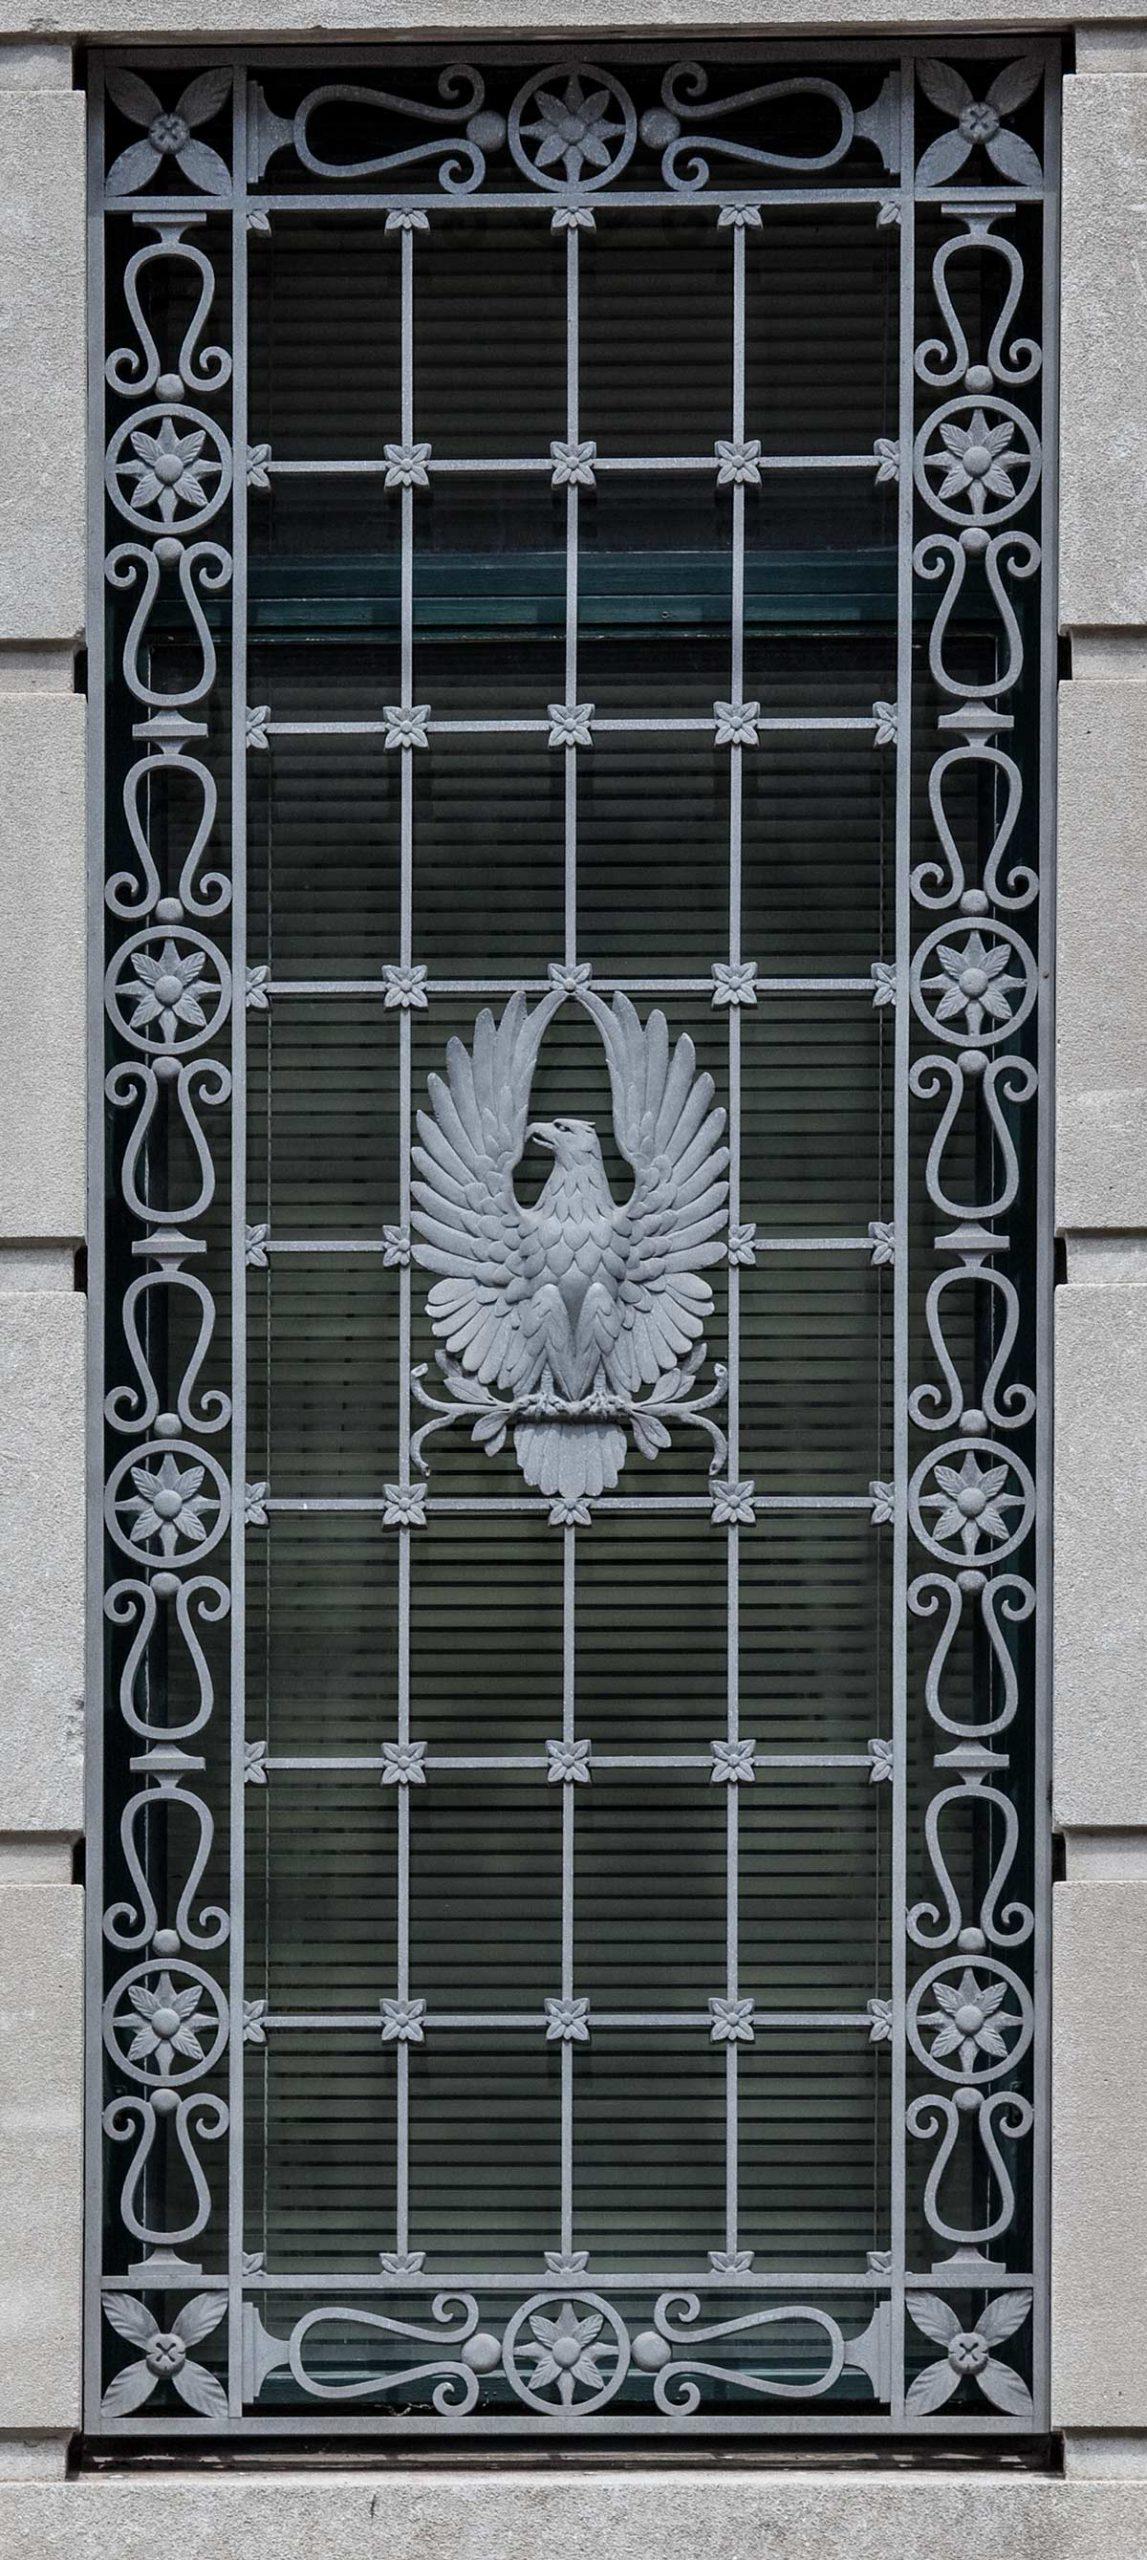 Exterior details, Clarkson S. Fisher Federal Building & U.S. Cou